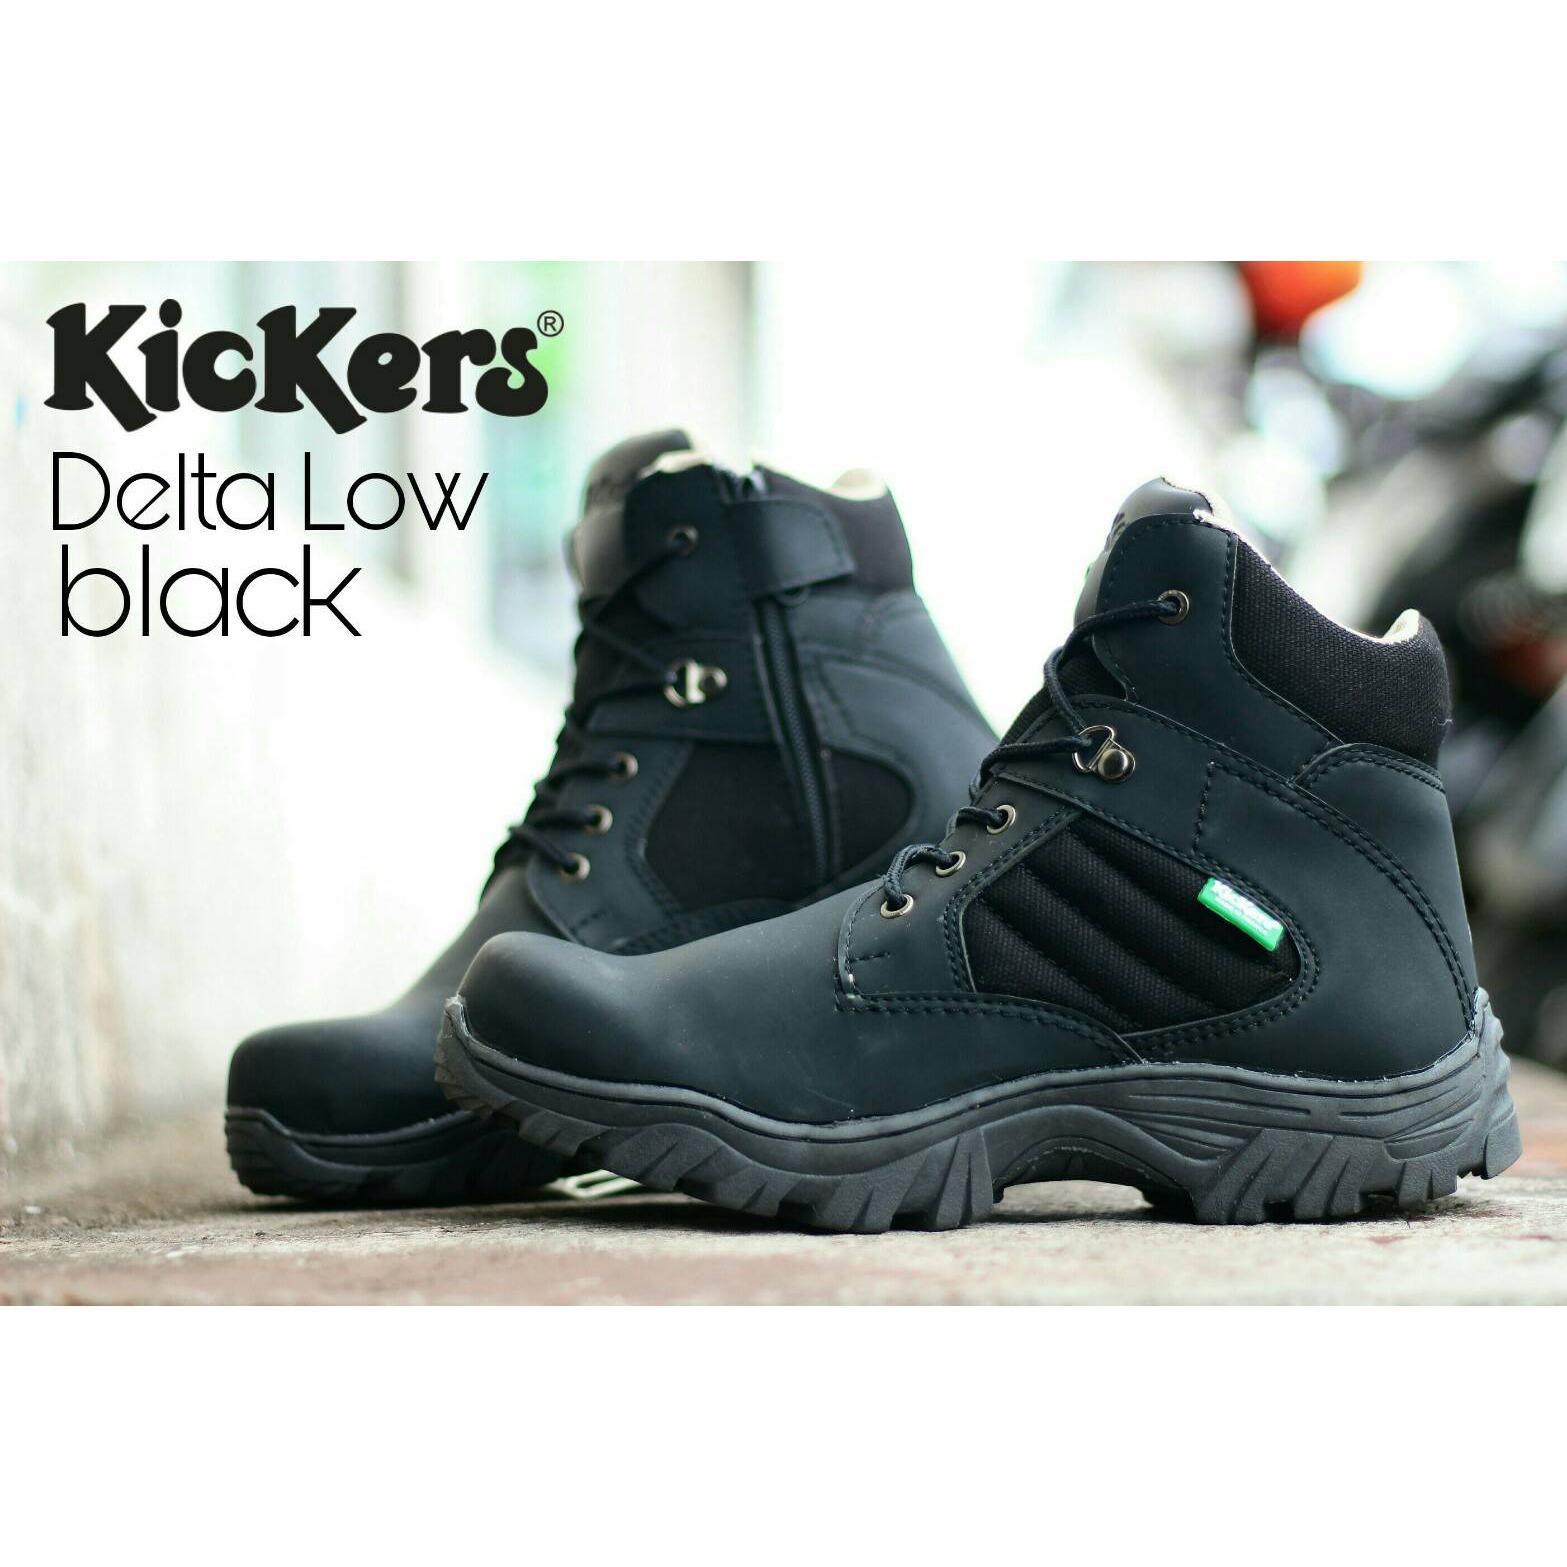 Sepatu Kickers Low Delta Safety Boots Ujung Besi Tracking Touring Motor Adventure Gunung Sepatu Haiking Outdoor Pdl Delta (Lokal)